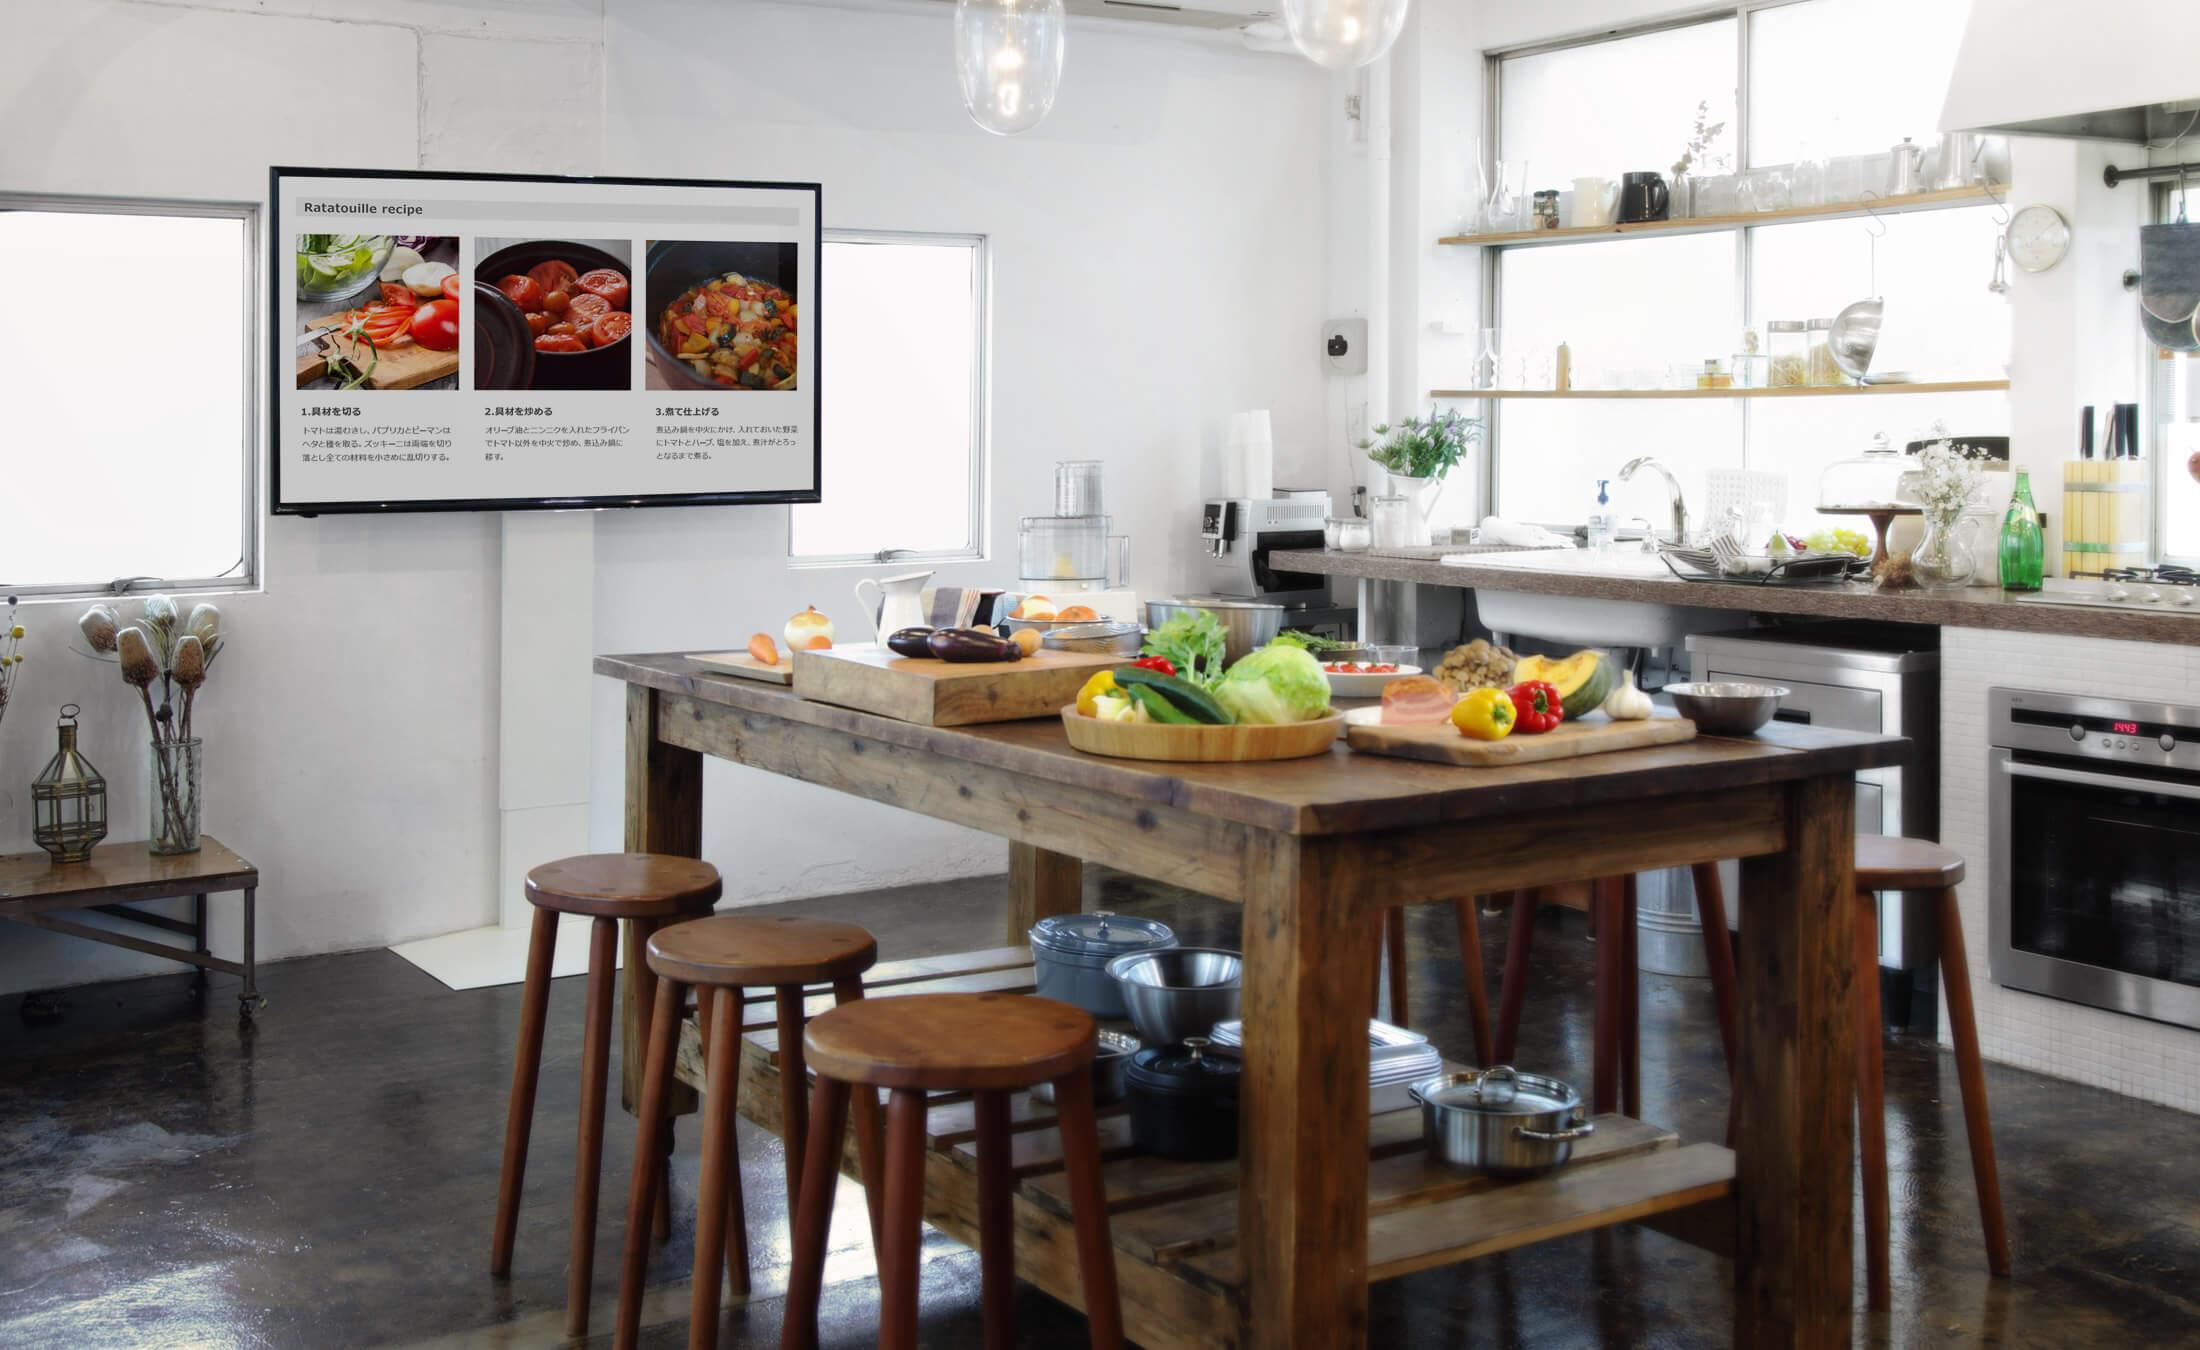 WALL INTERIOR TV STAND V3 壁寄せテレビスタンドV3 DINING & KITCHEN 1枚目